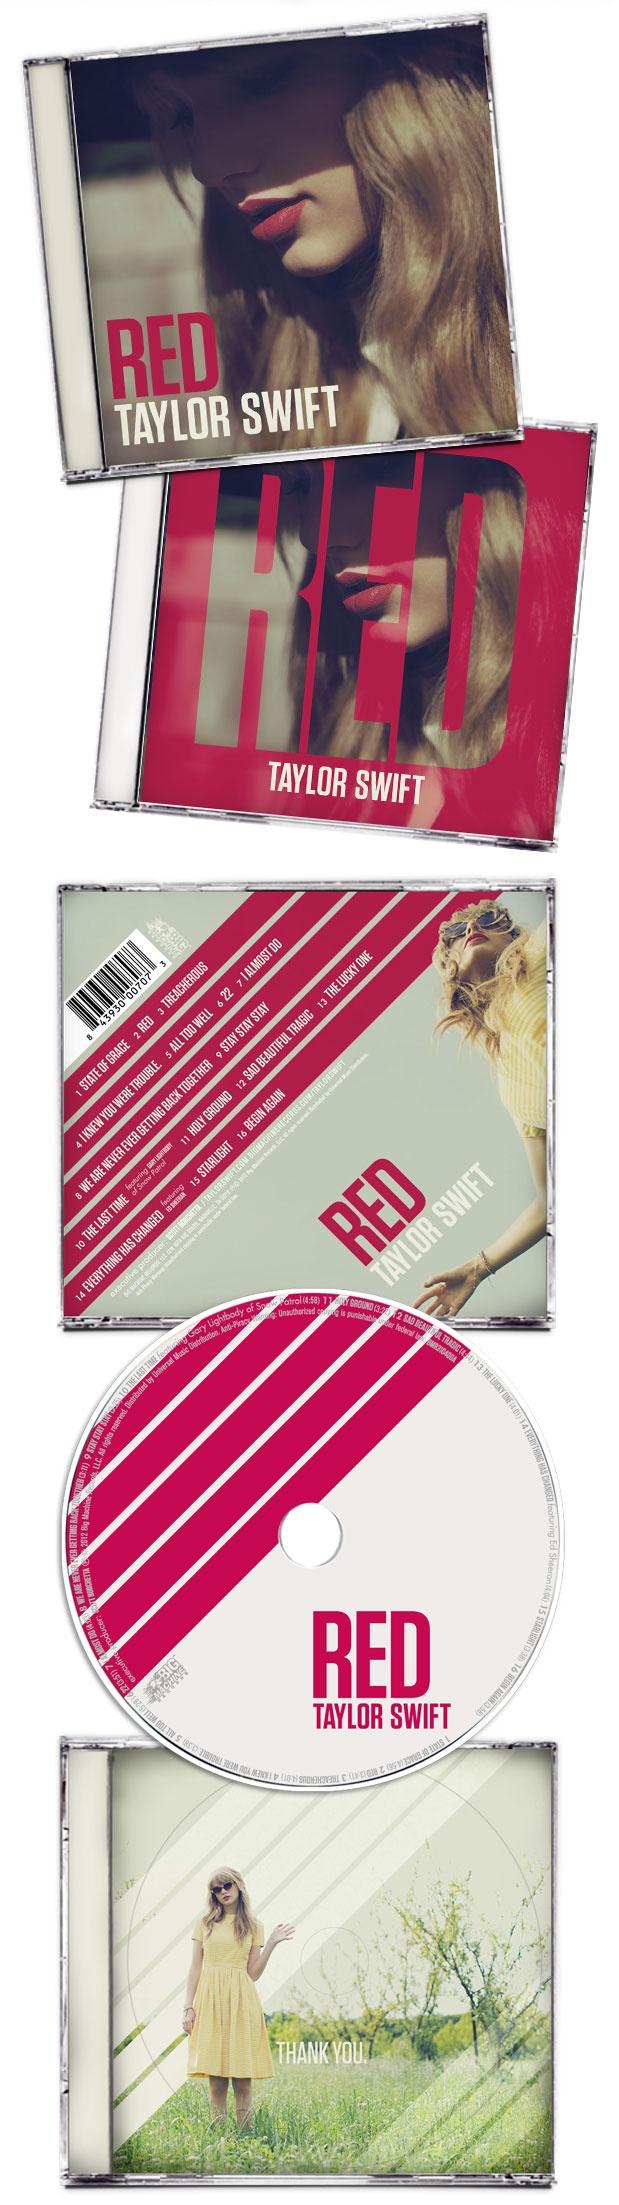 Taylor Swifts new album design is dope. Just say'n - Good work @Hale_Yeah via @St8mnt blog